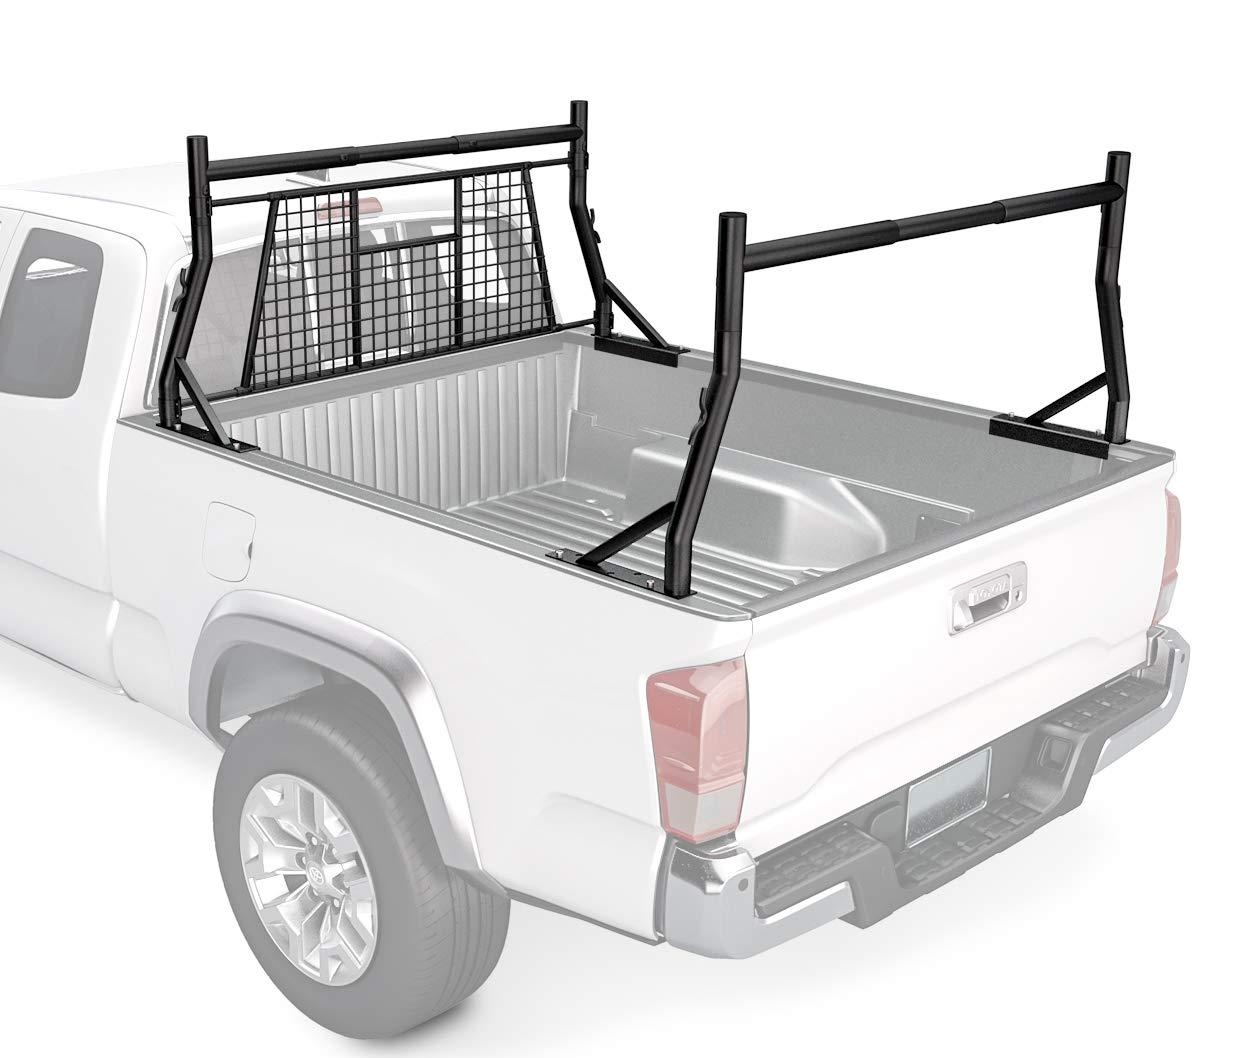 STKUSA Adjustable Bed Headache Ladder Full Size Truck Cargo